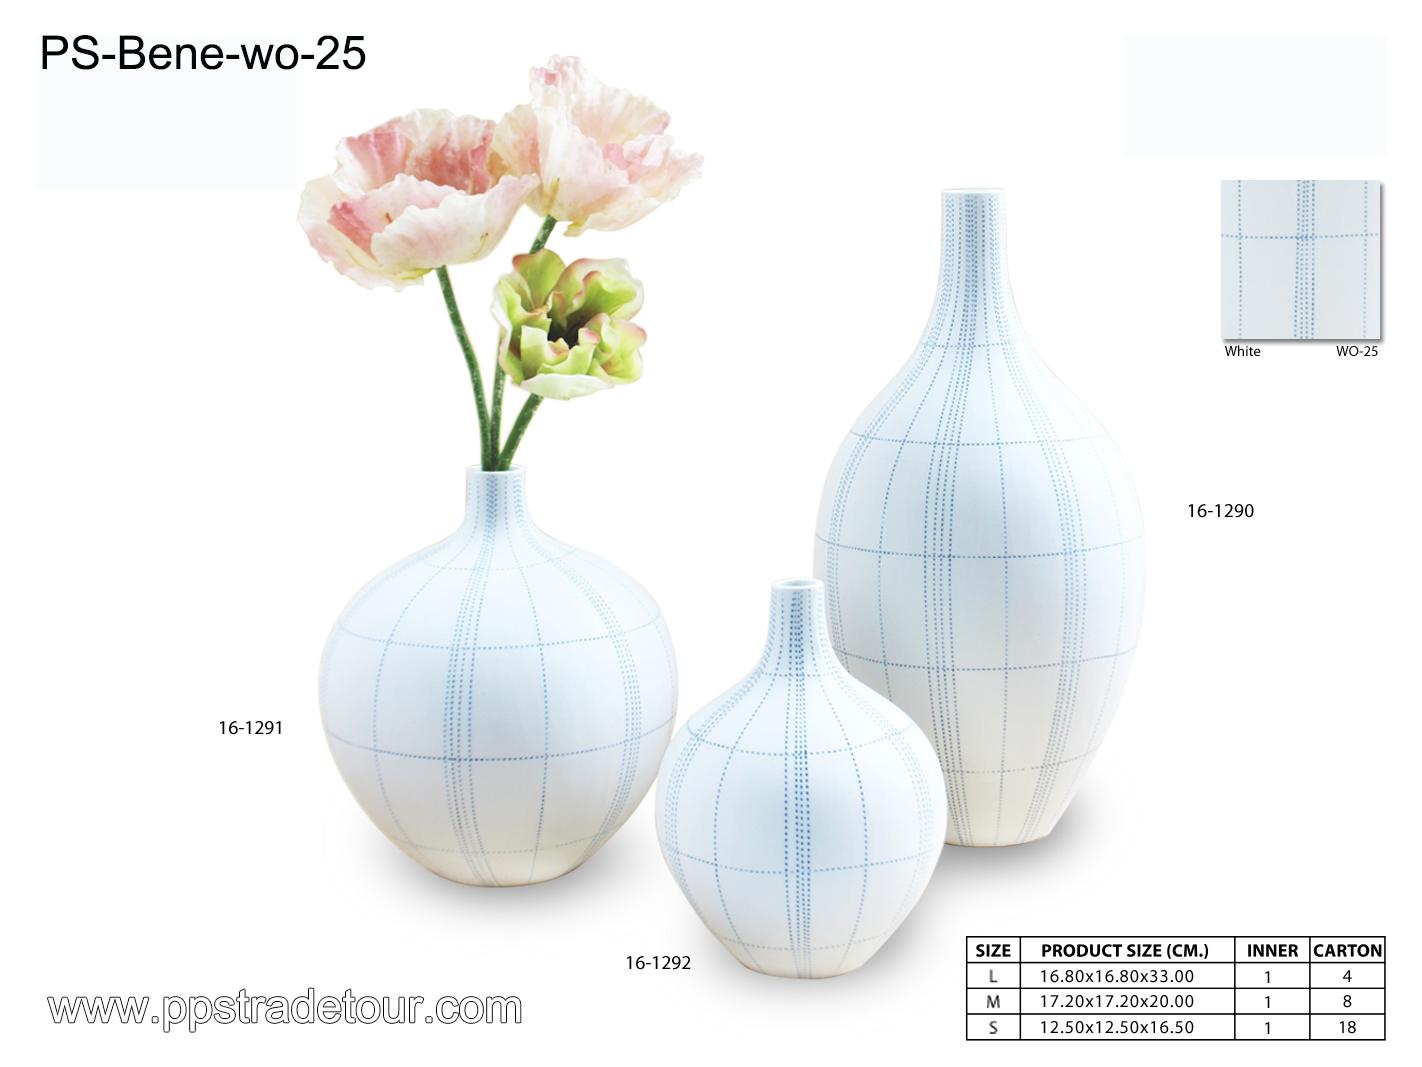 PSCV-bene-wo-25